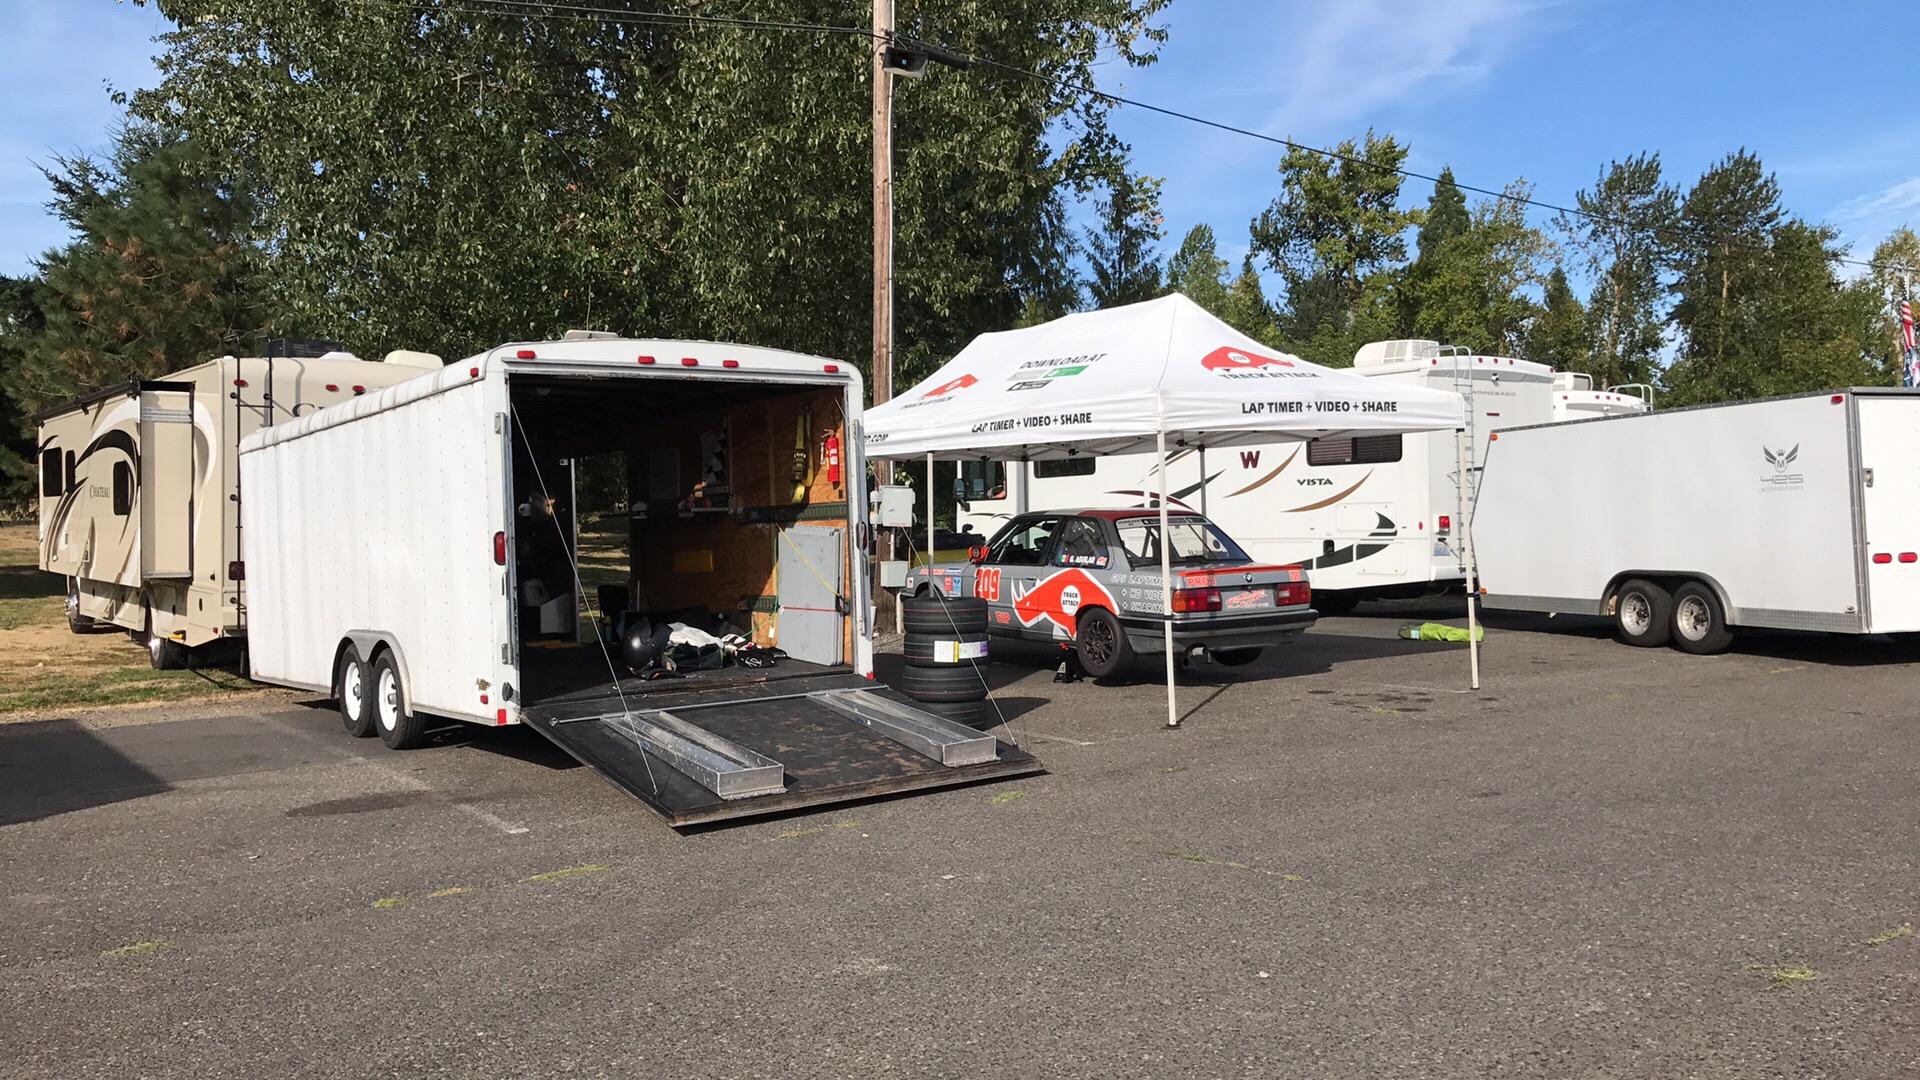 Our setup at Portland International Raceways